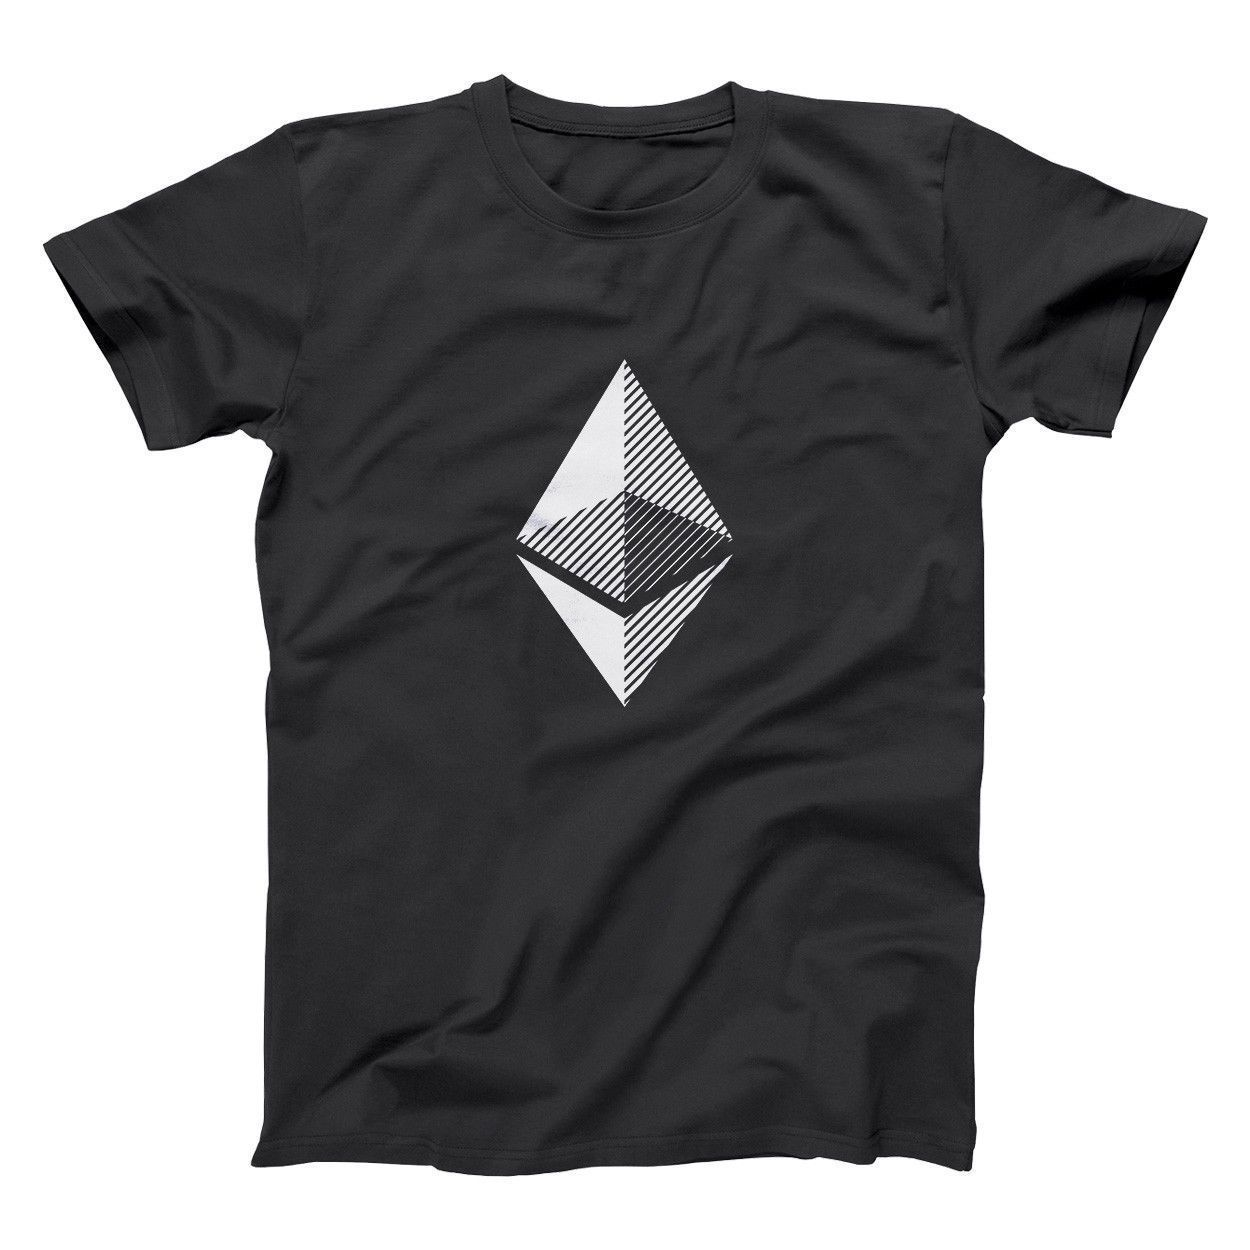 Ethereum Cryptocurreny Bitcoin Mining Miner Geek T-Shirt Summer Mens Print T Shirt Short Sleeves 100% Cotton